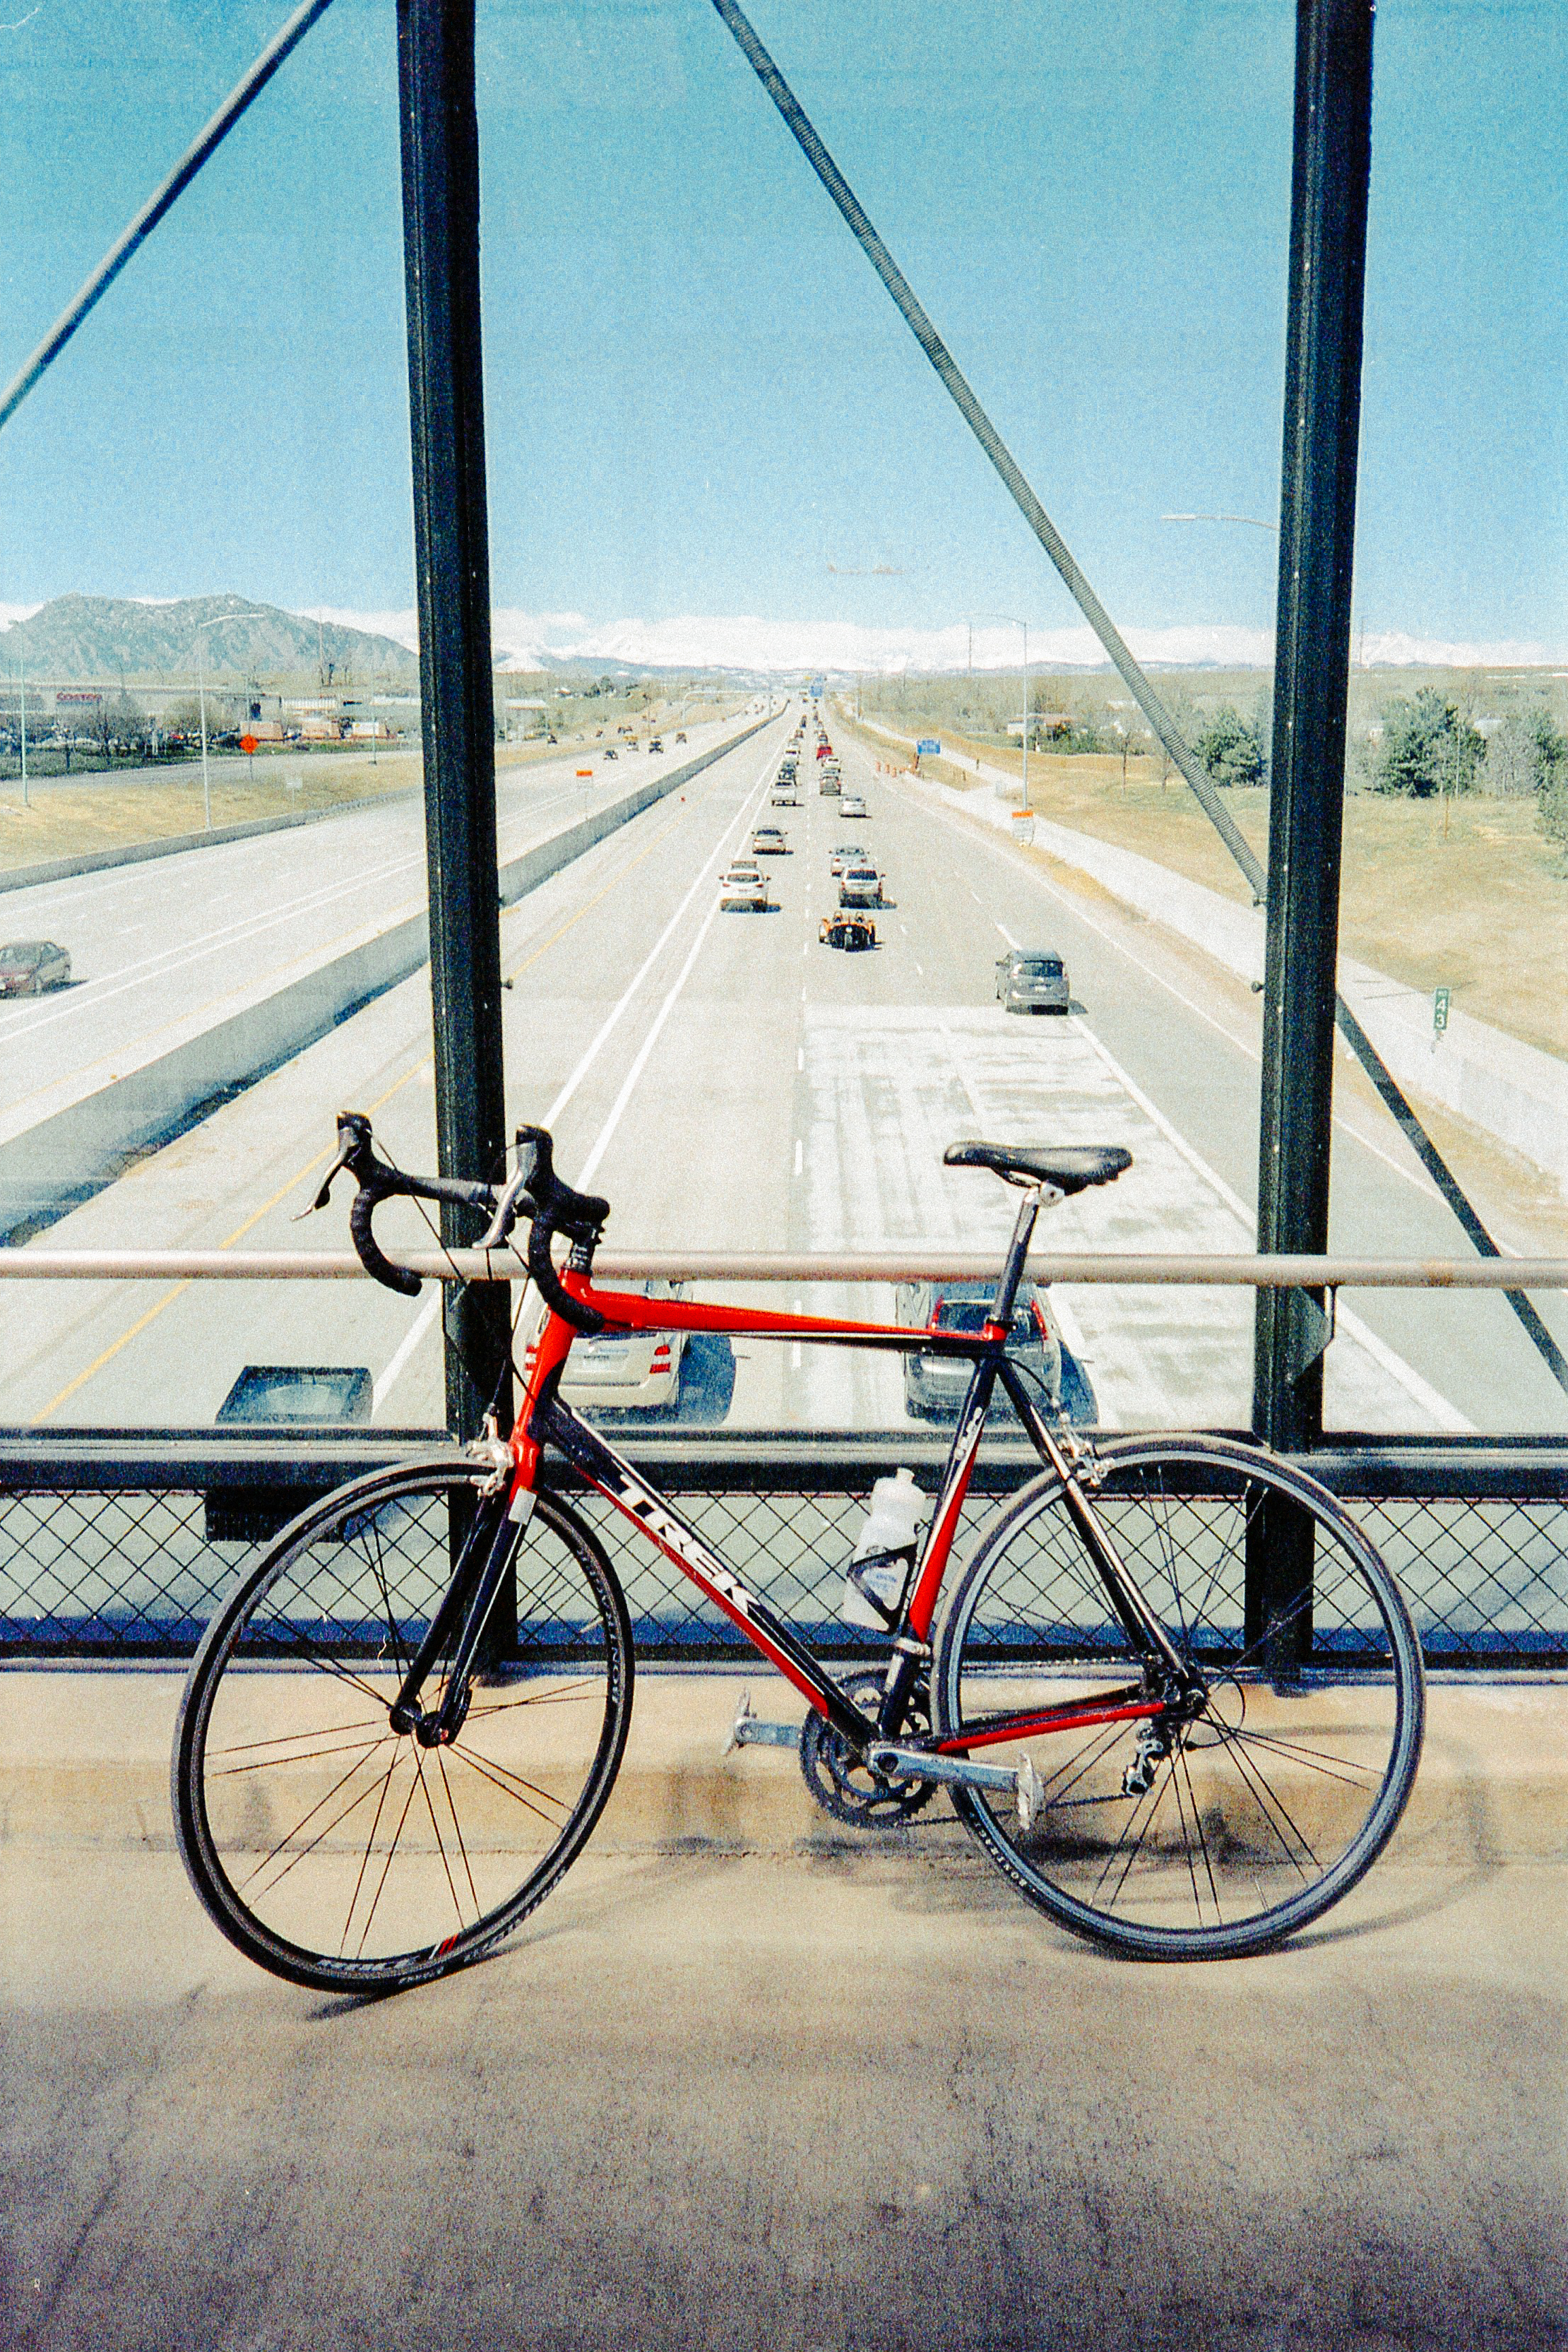 Stylus Infinity - Bike over 36 2.jpg